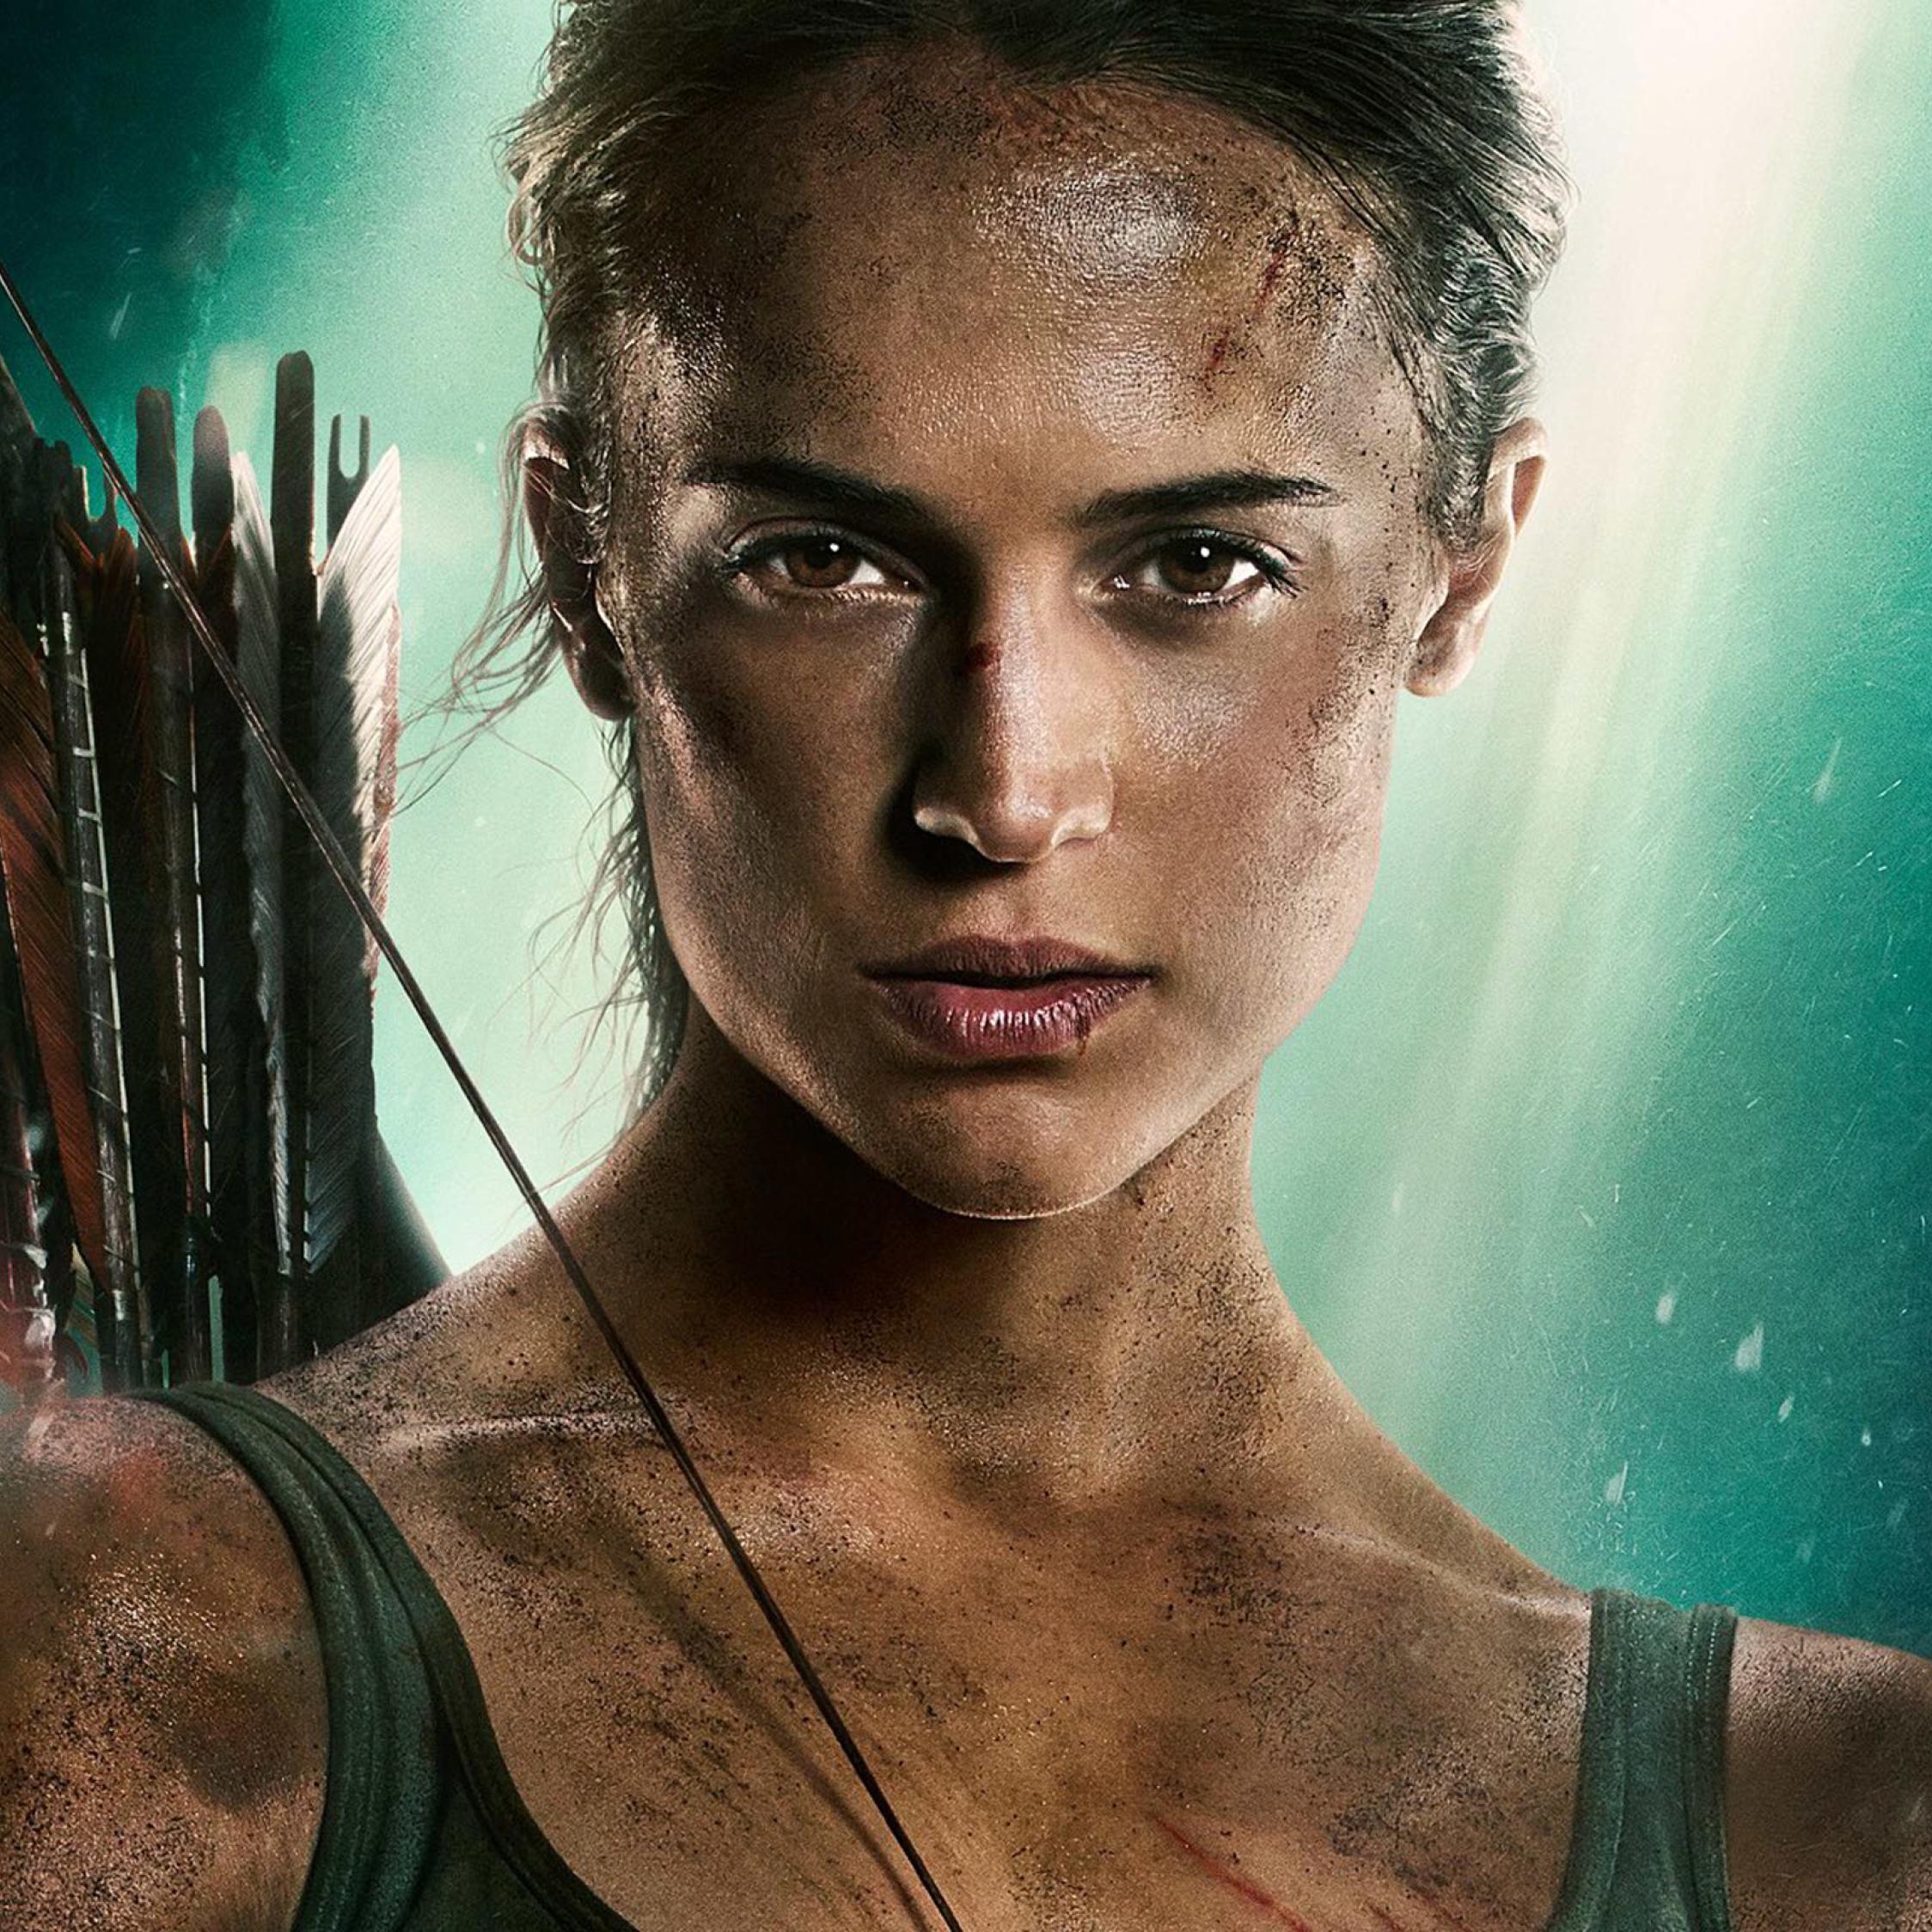 Wallpaper Tomb Raider 2018: Alicia Vikander New Tomb Raider Poster 2018, Full HD Wallpaper